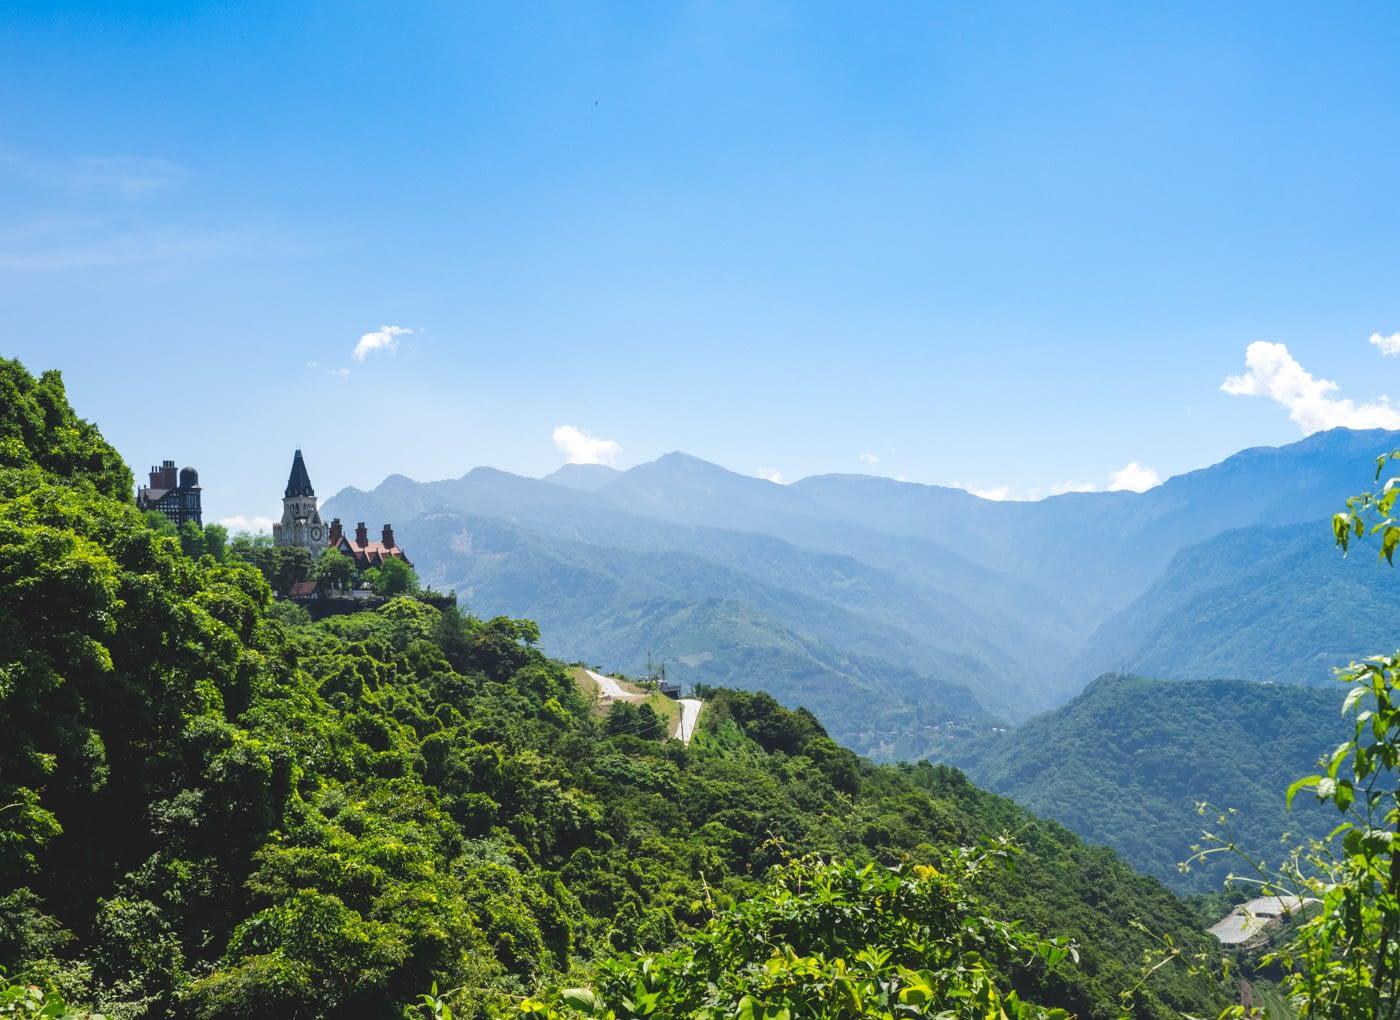 Taiwan - Qingjing - Castle with a clock